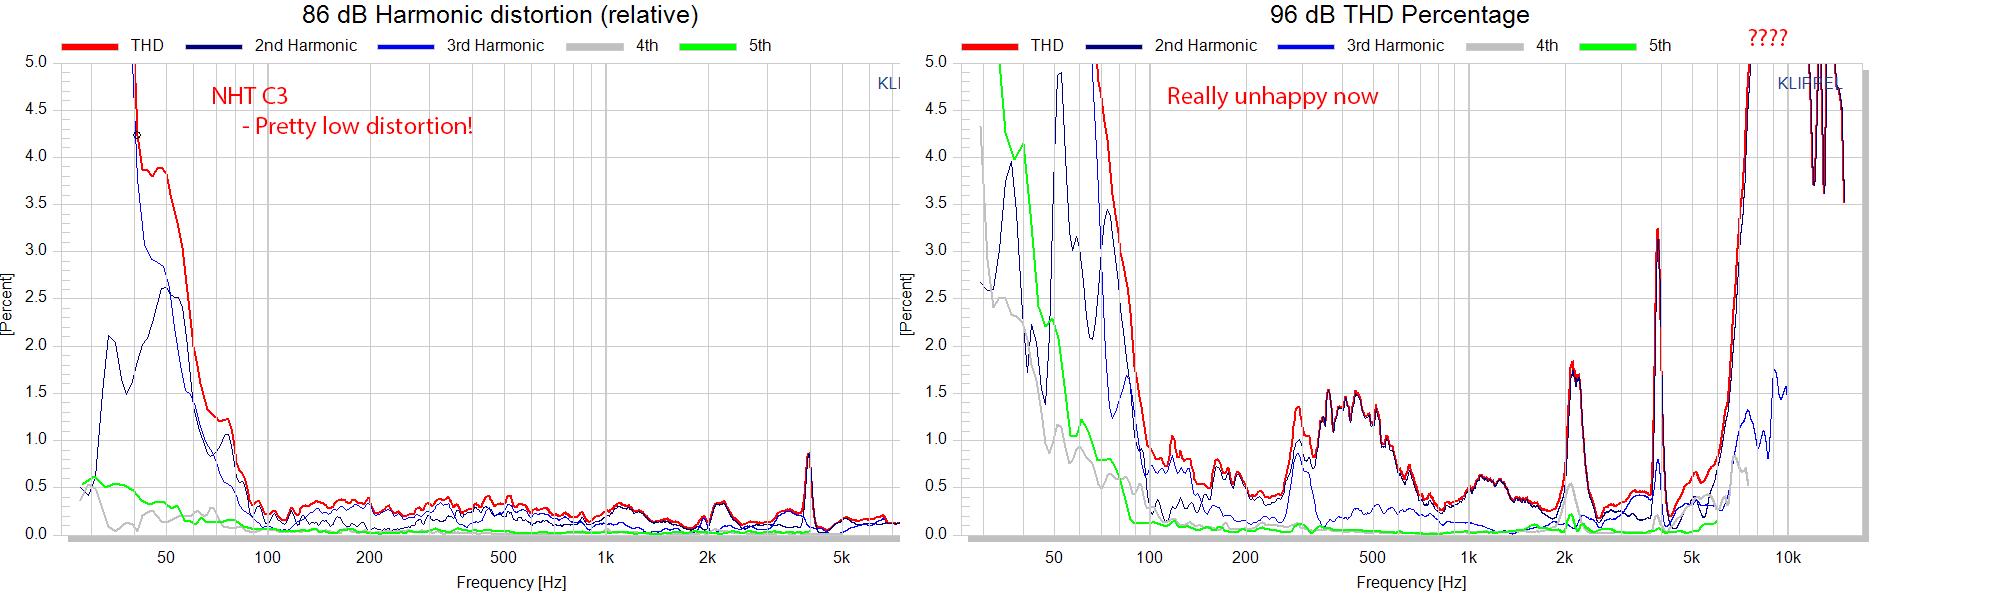 NHT C3 Measurements Speaker relative distortion.png